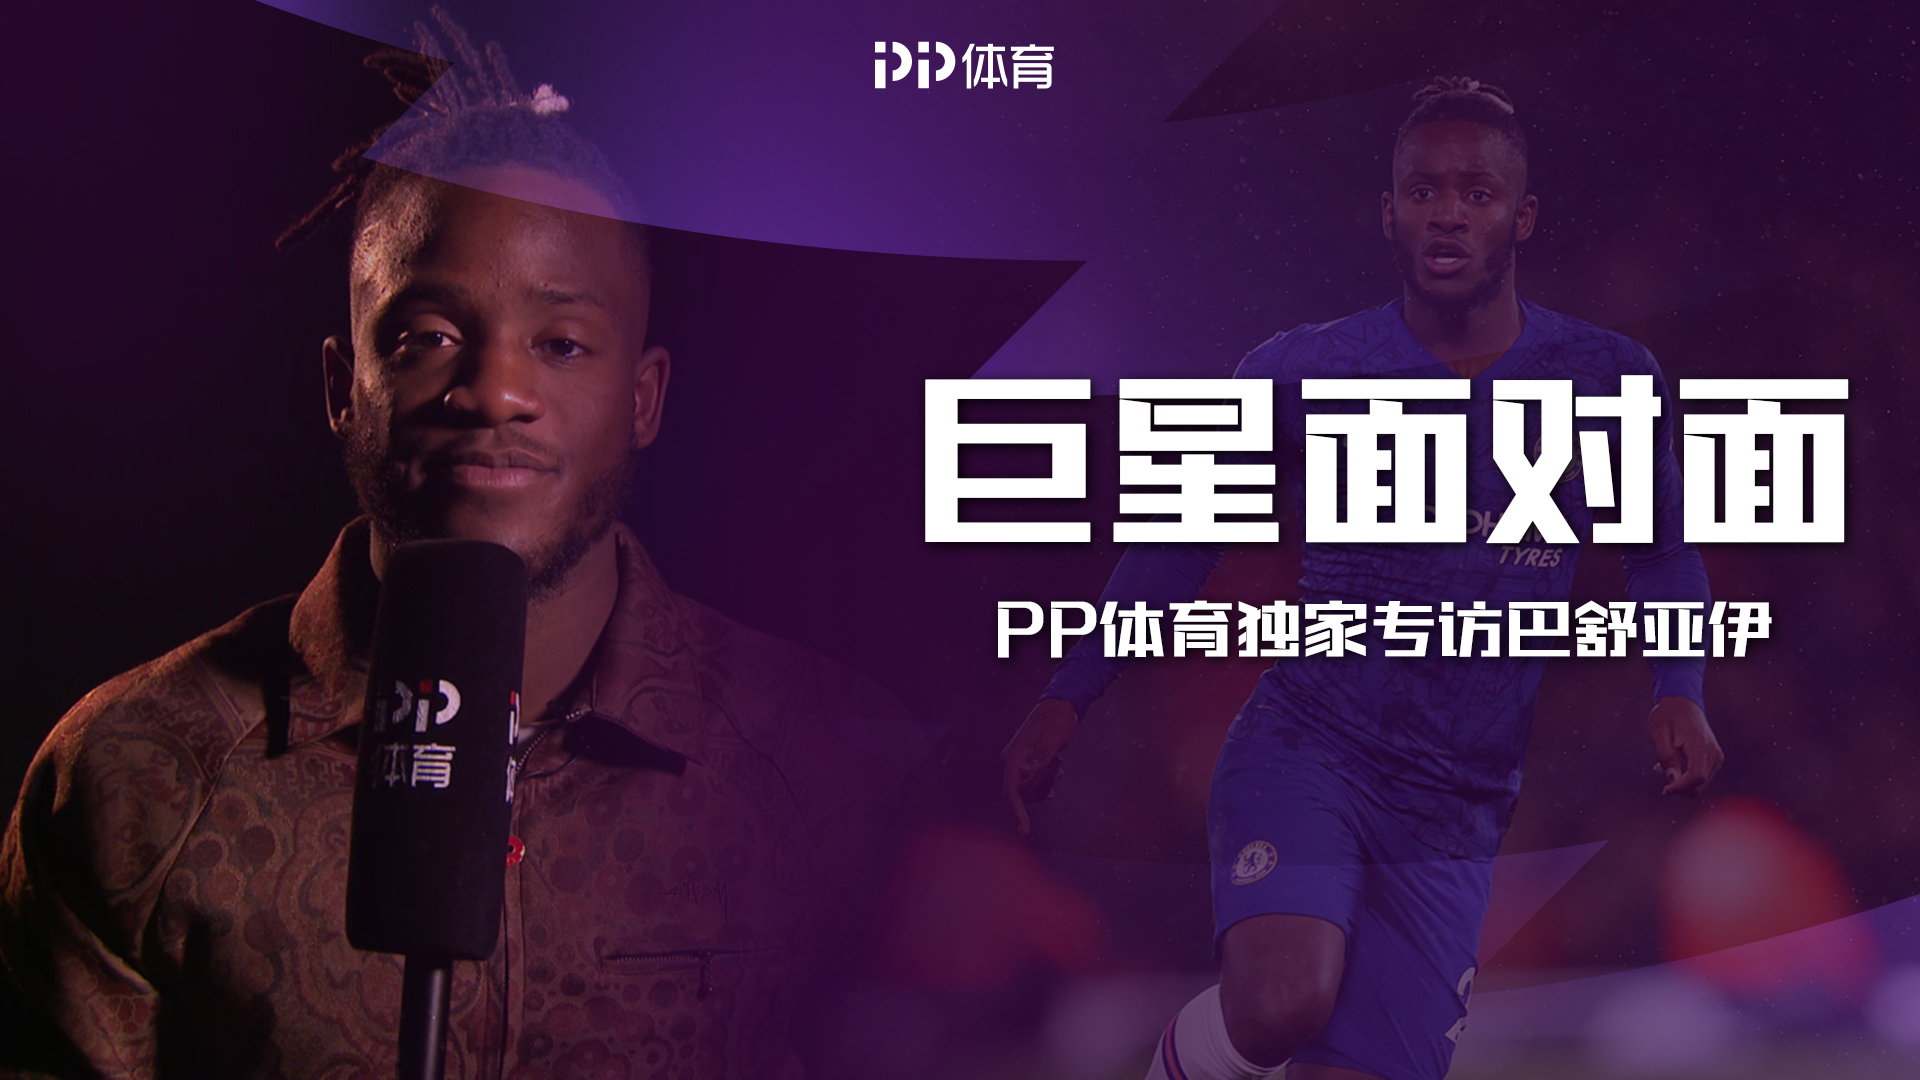 PP体育独家专访巴舒亚伊:愿做队中开心果 知道卡拉斯科在中国